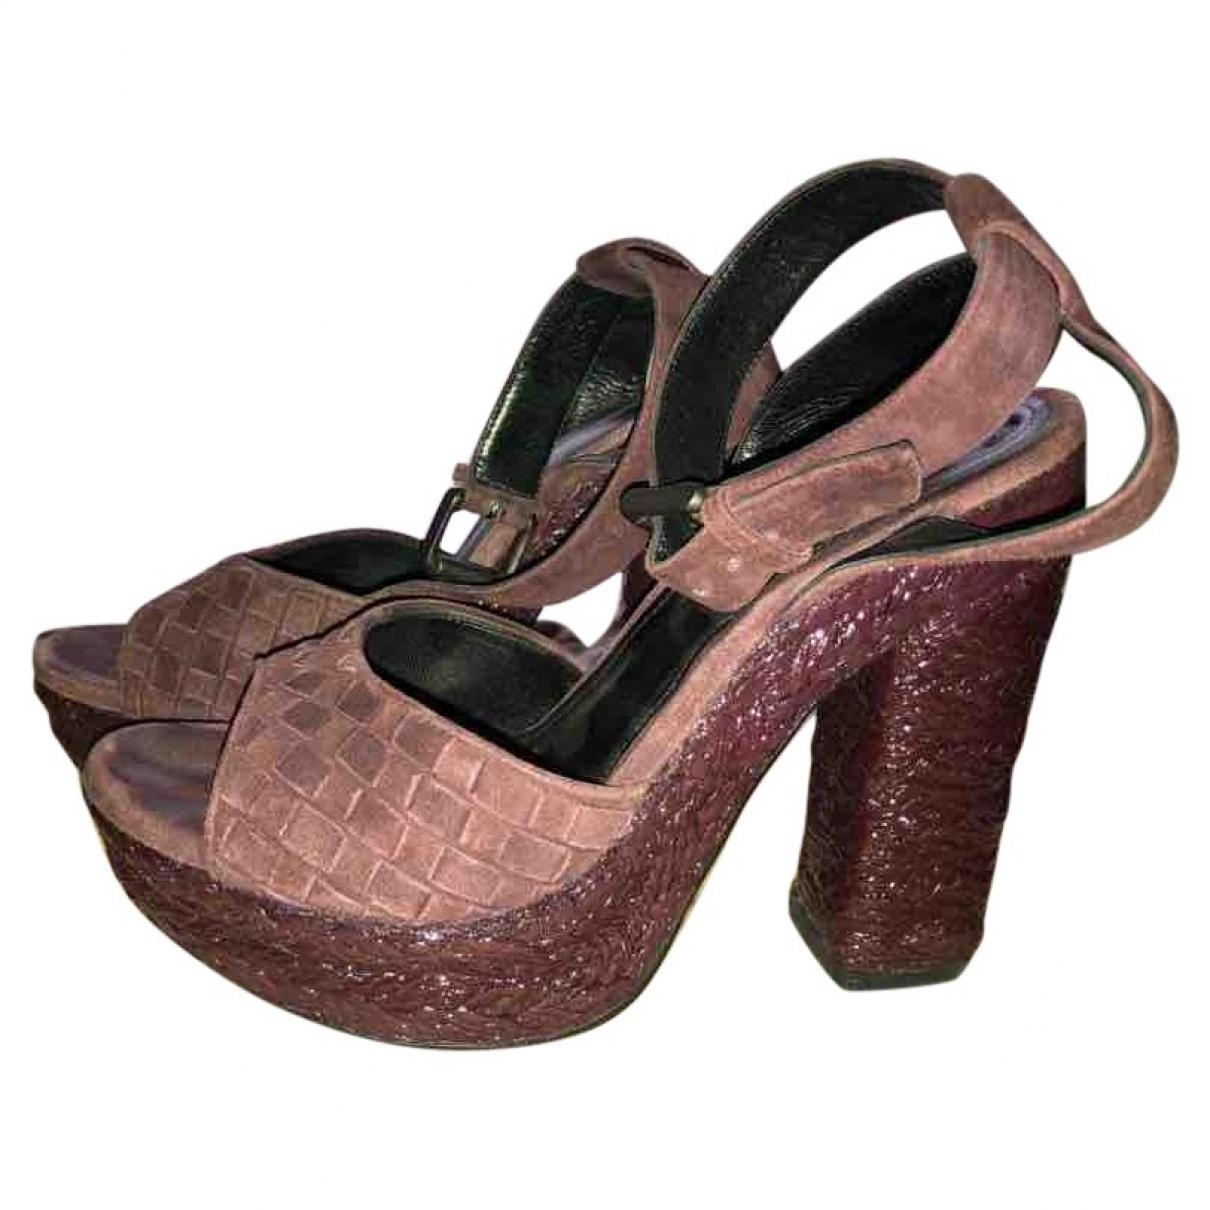 Bottega Veneta - Sandales   pour femme en suede - violet